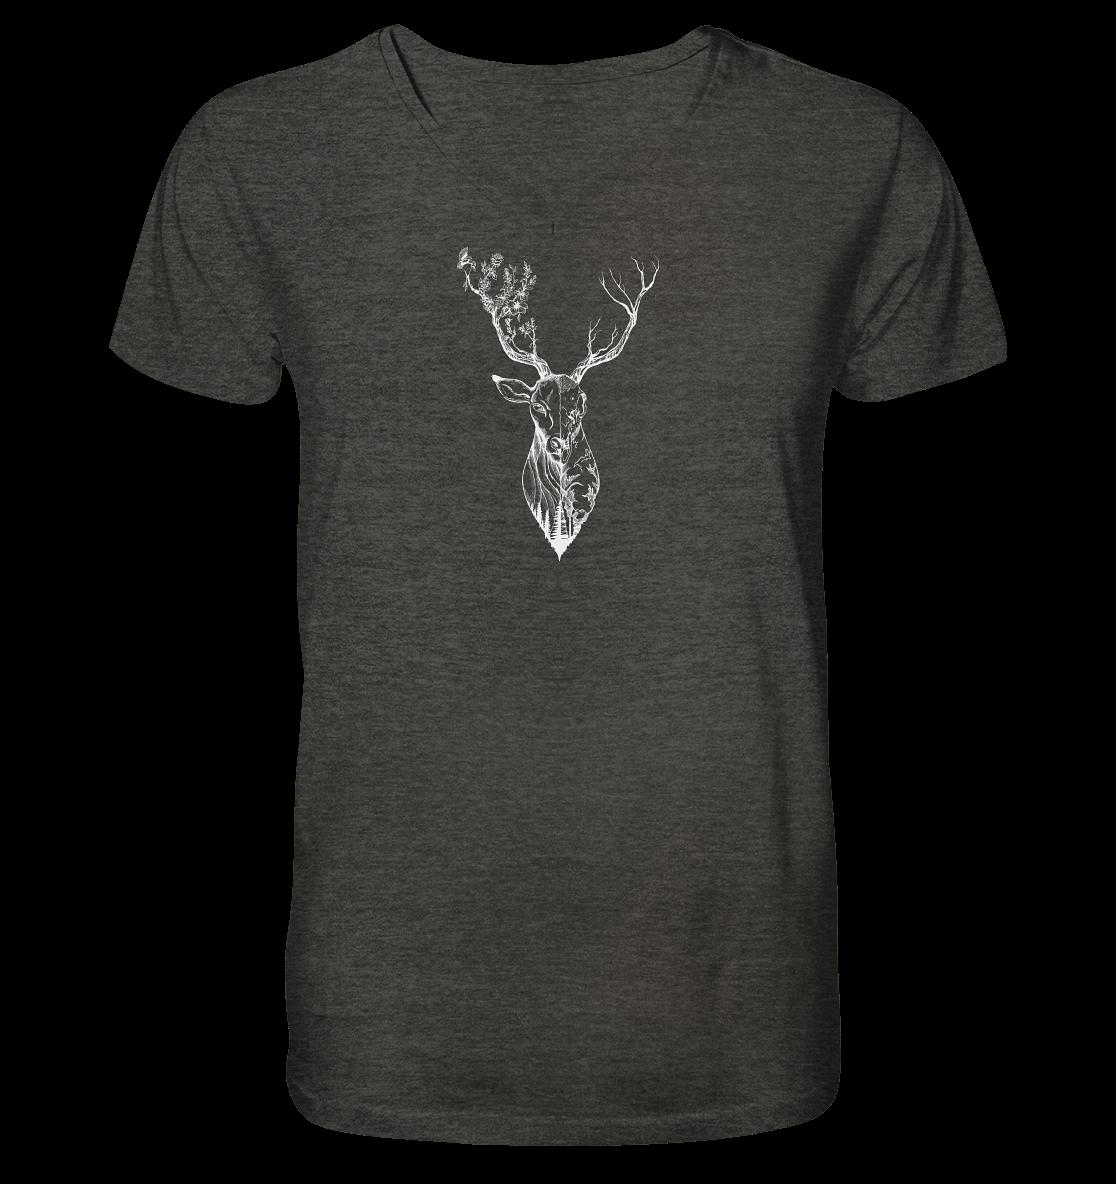 front-mens-organic-v-neck-shirt-252625-1116x-6.png